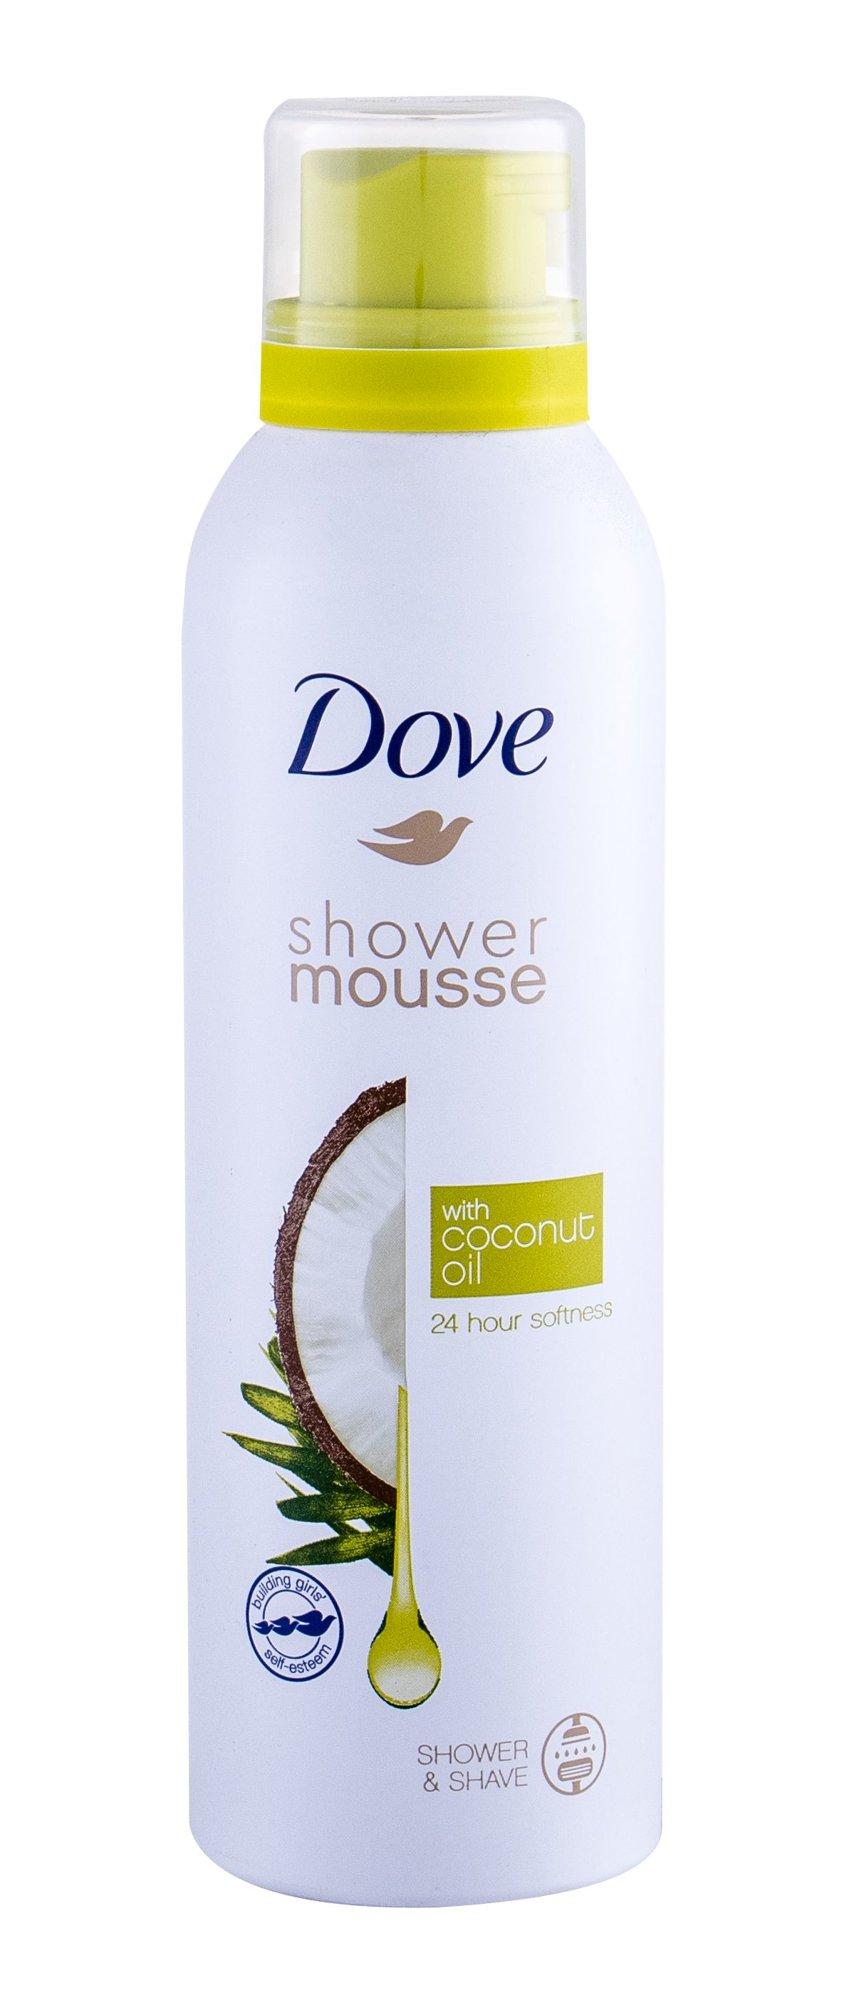 Dove Shower Mousse Shower Foam 200ml